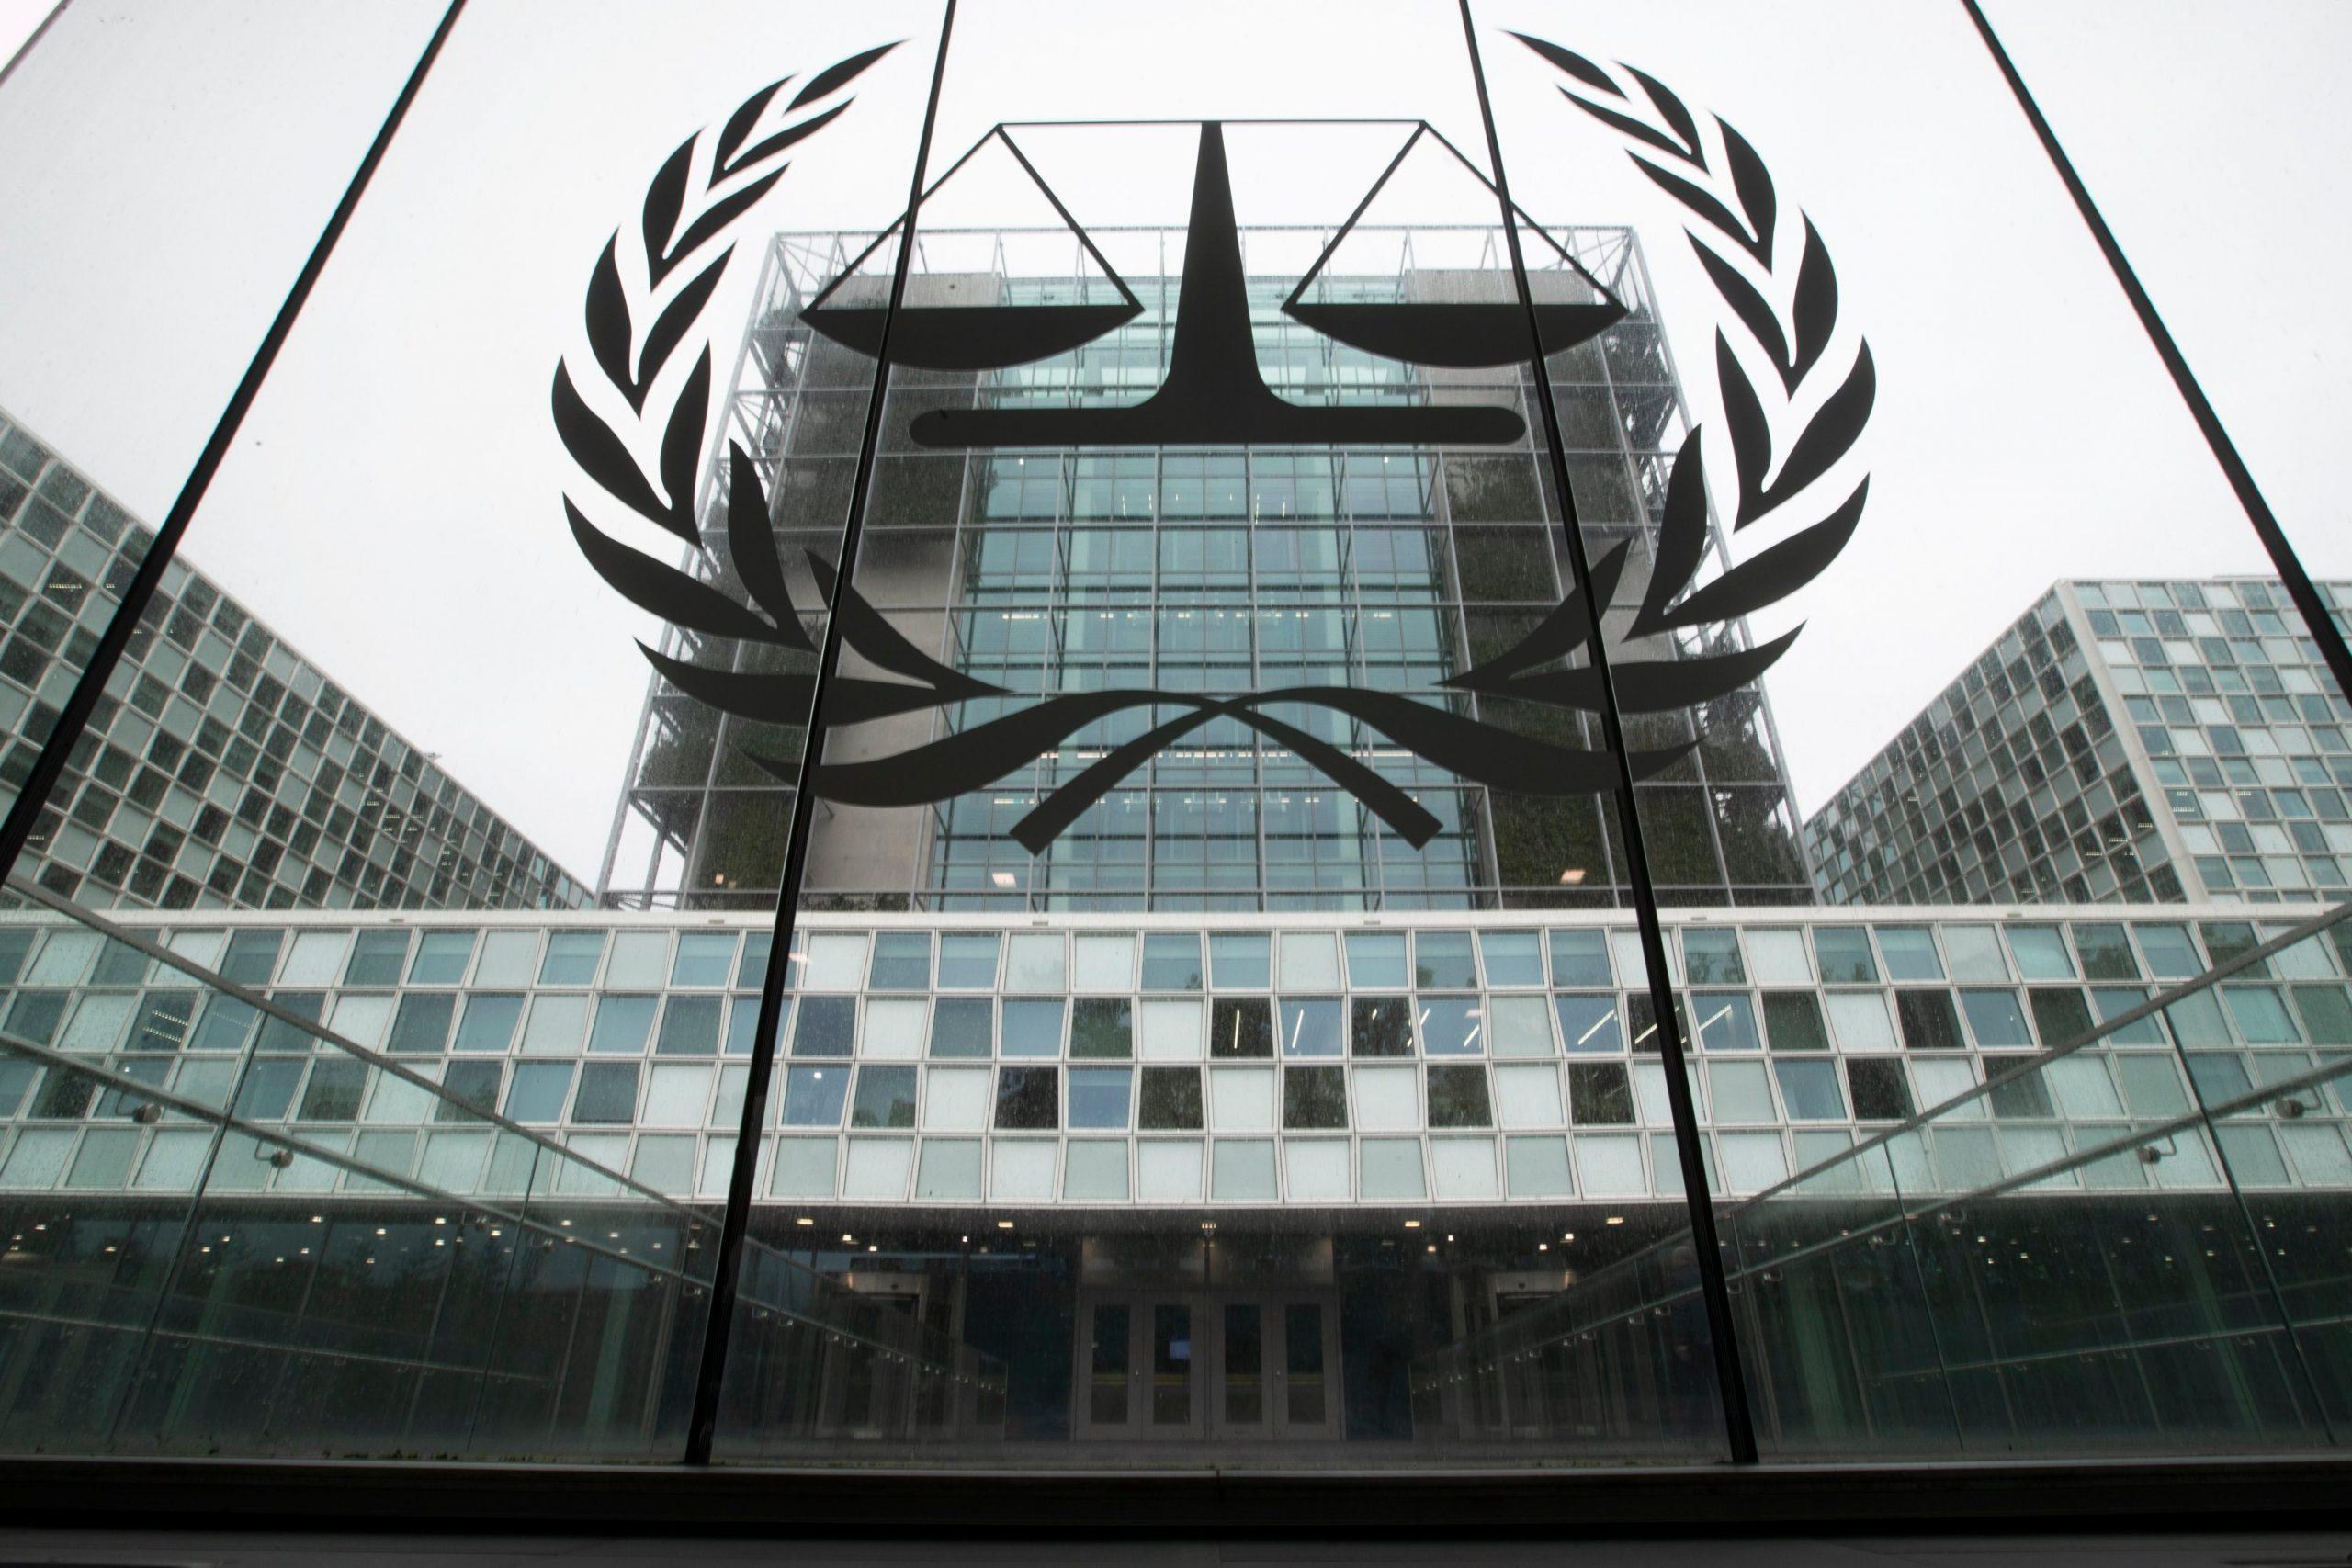 Global News: The International Criminal Court